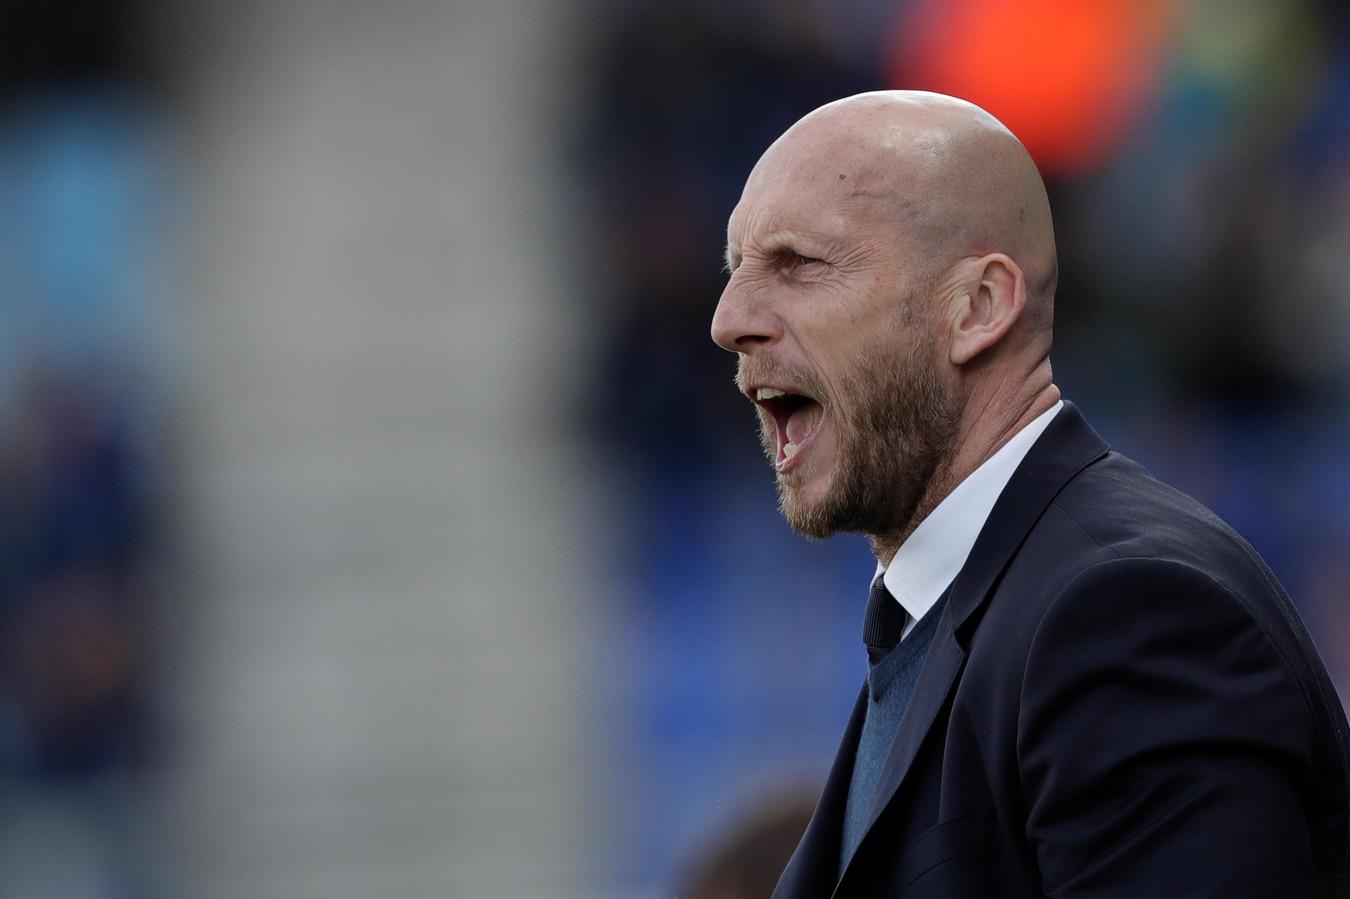 coach Jaap Stam of PEC Zwolle during PEC Zwolle - VVV-Venlo NETHERLANDS, BELGIUM, LUXEMBURG ONLY COPYRIGHT BSR/SOCCRATES